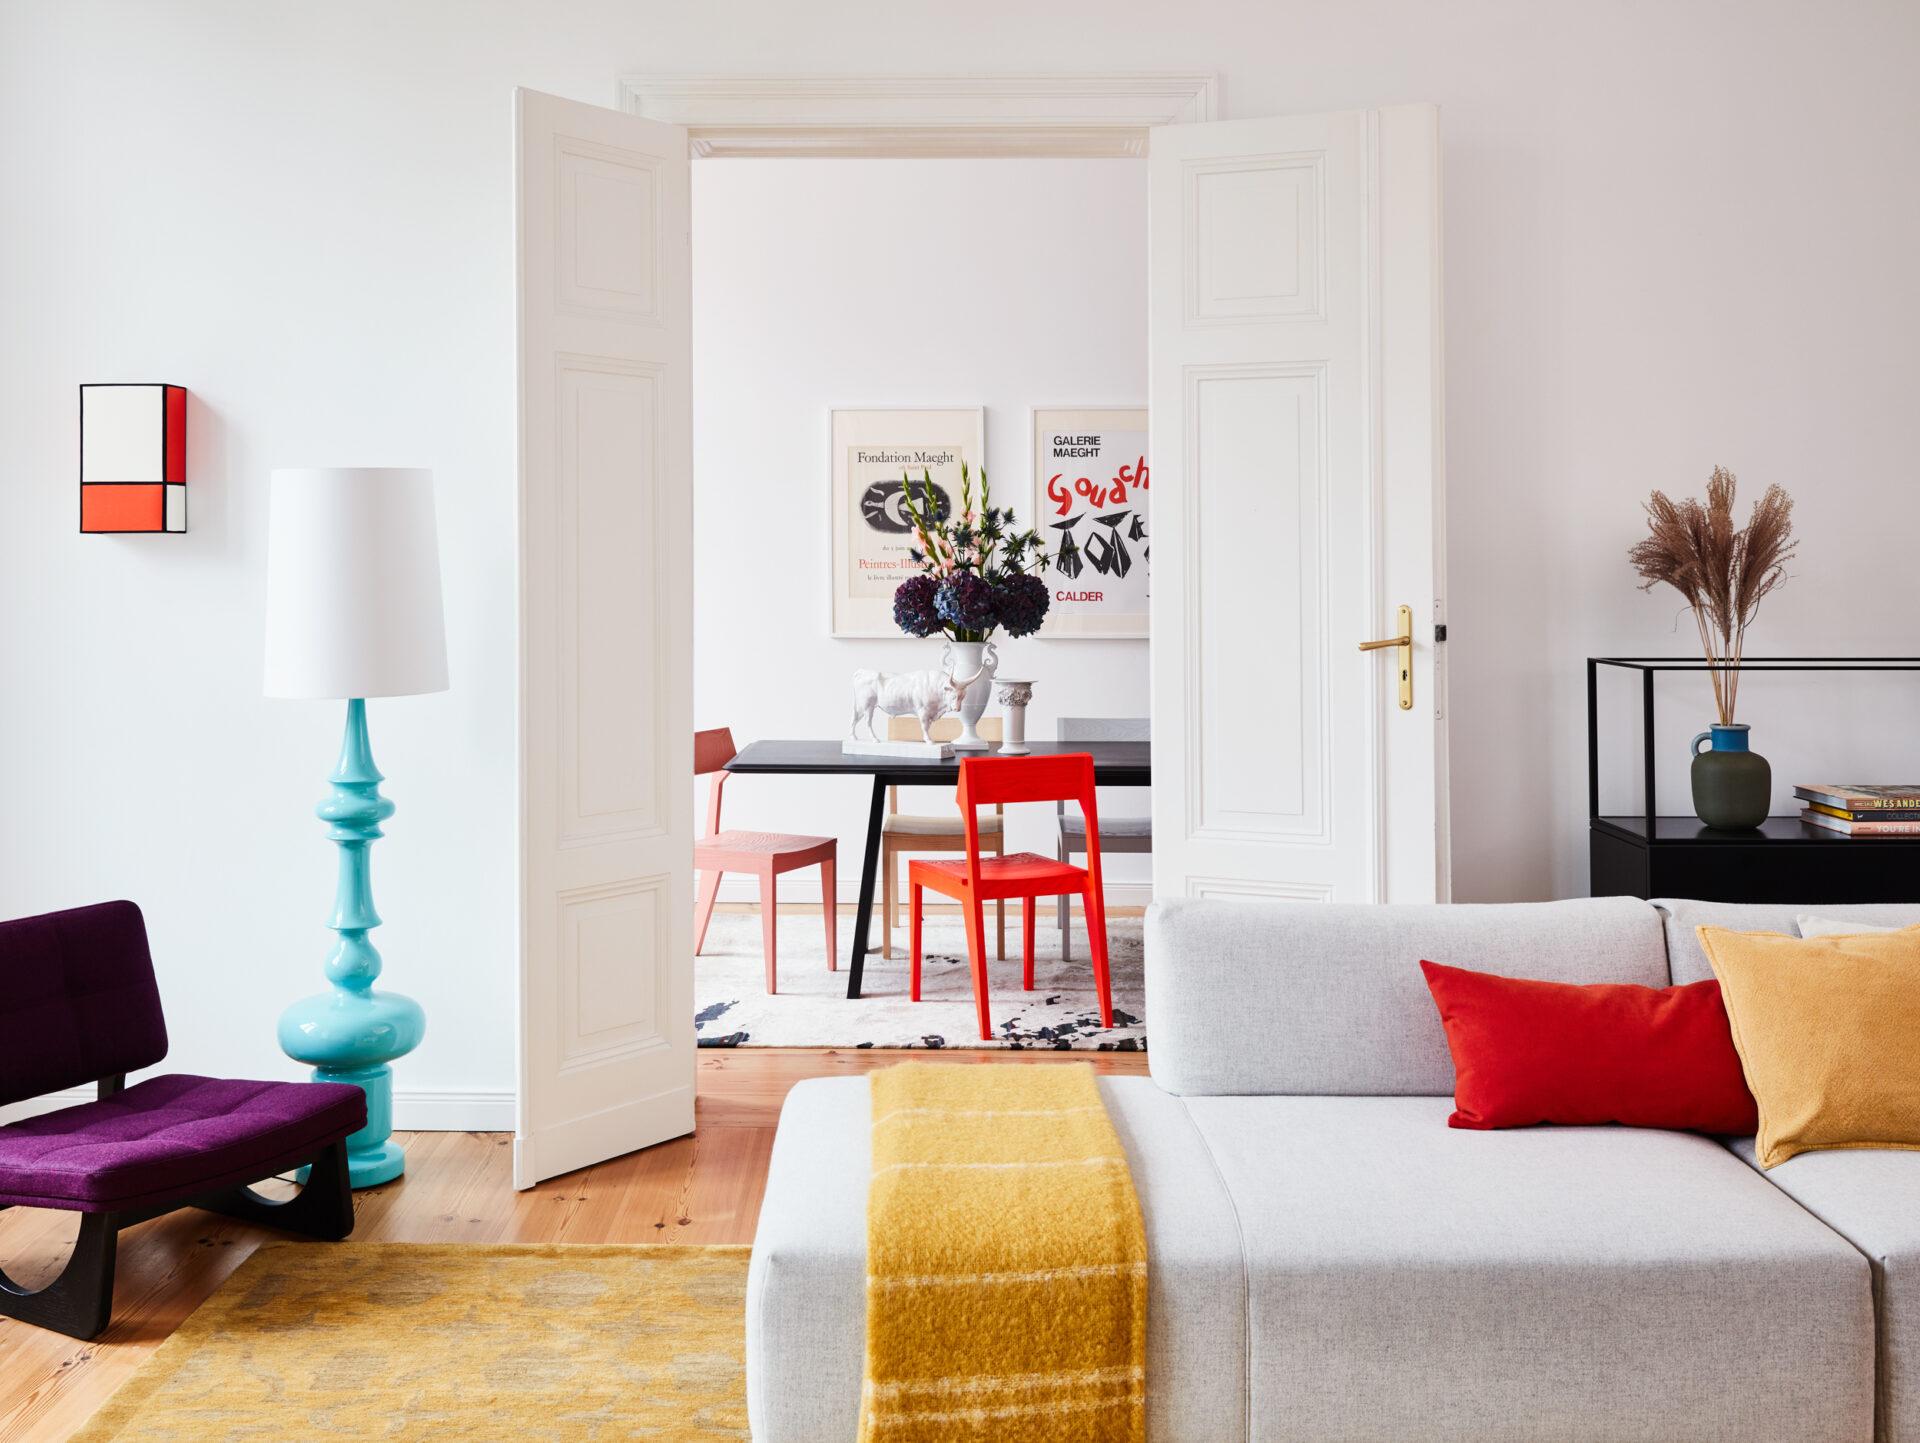 Antonius Schimmelbusch_Apartment Berlin_Ragnar Schmuck_David Borck_02